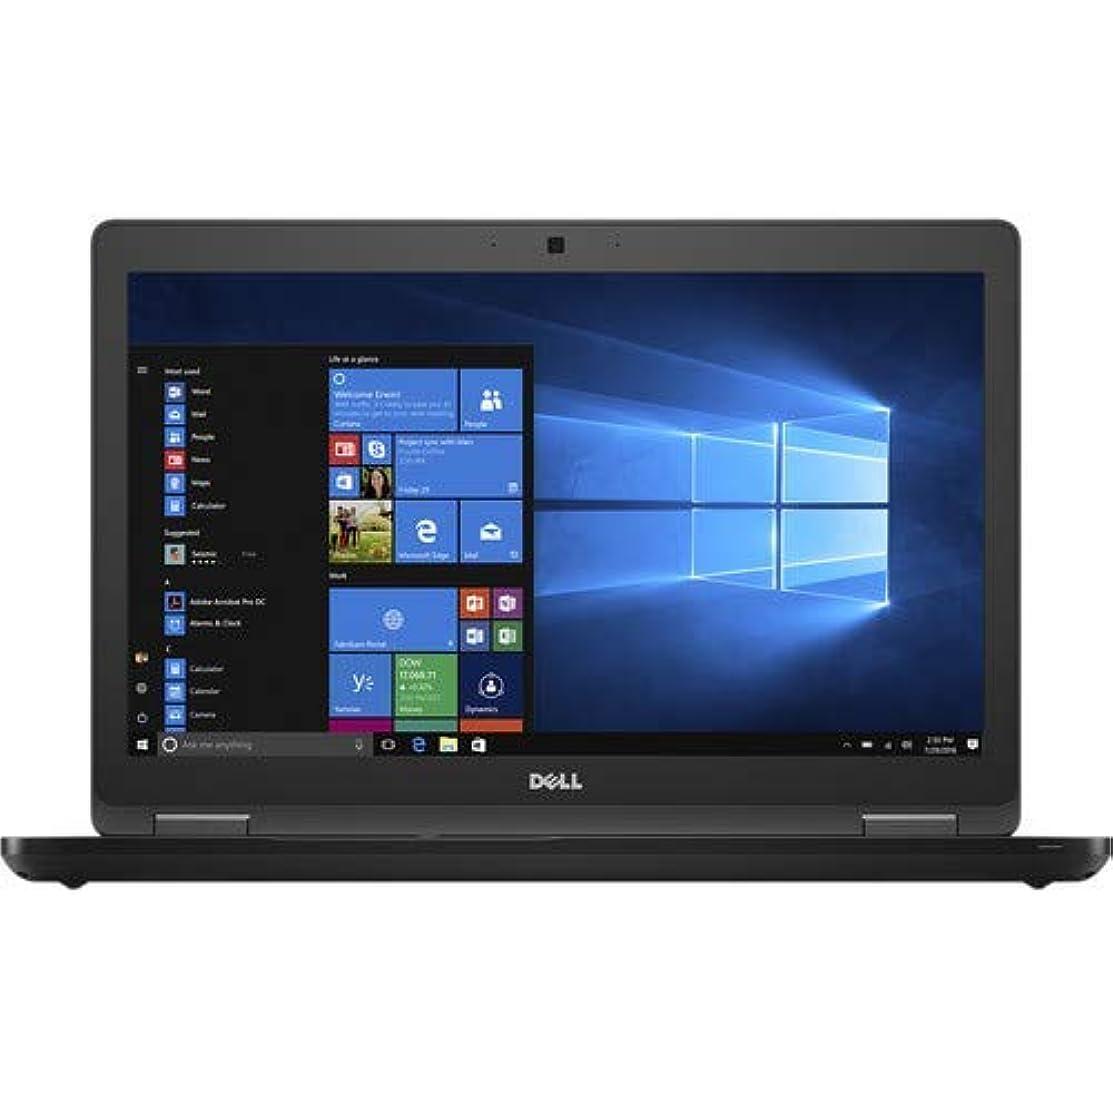 Dell Latitude 15 5580 - 15.6in FHD   2.9 GHz Intel i7-7820HQ Quad-Core   16GB DDR4   256GB SSD   Win 10 pro (Renewed)